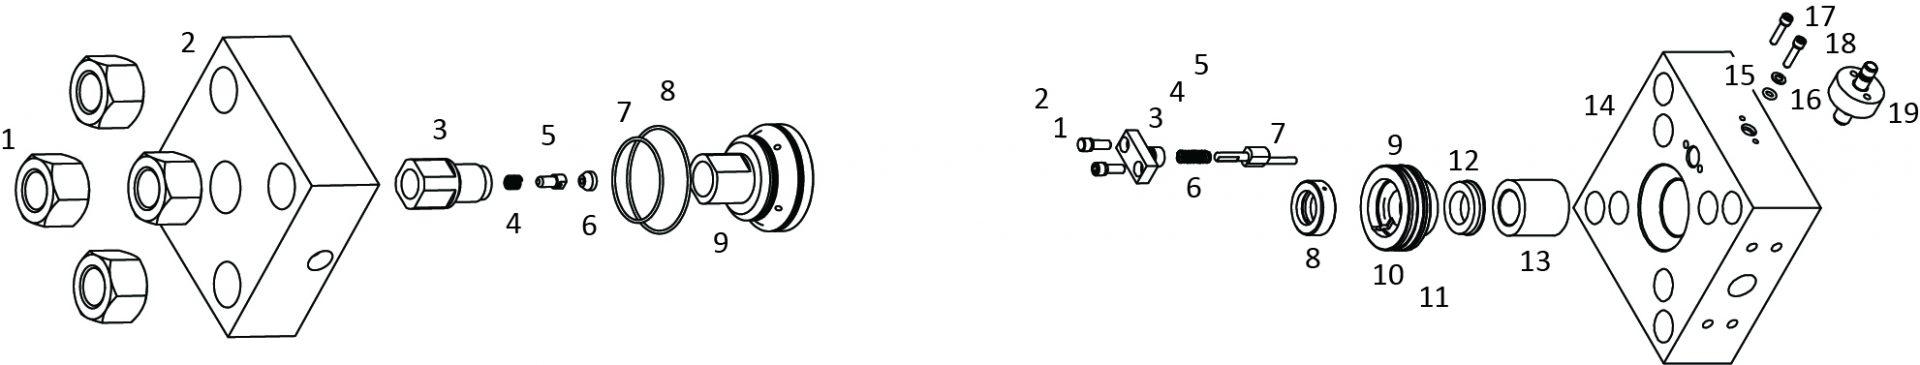 composant pompe accustream2 - Component High Pressure Pump